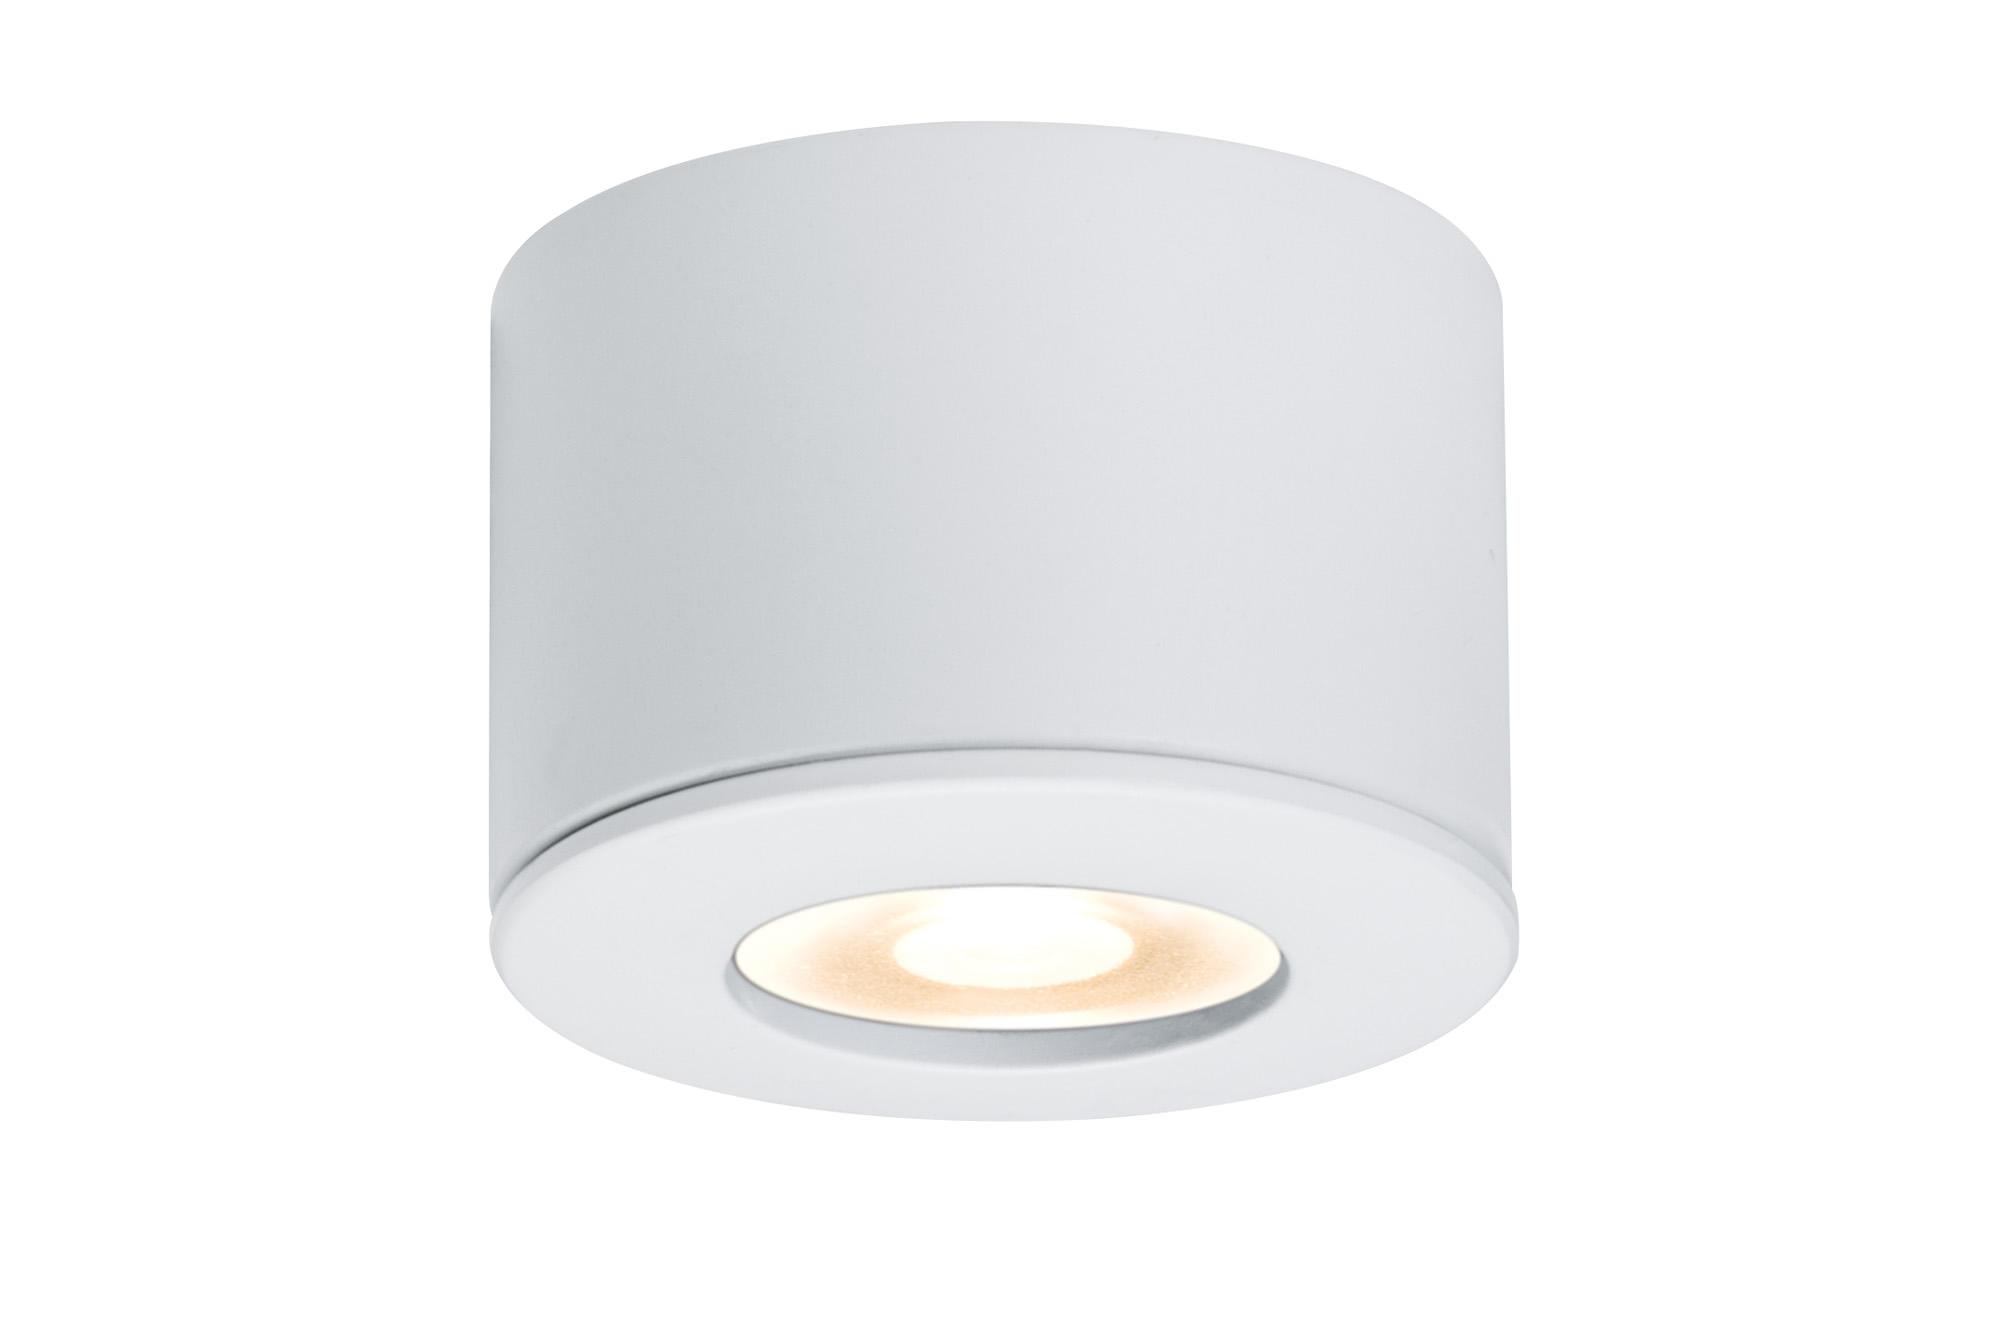 Paulmann. 92582 Светильник мебельный ABL Bitsy LED 1x1,2W, белый